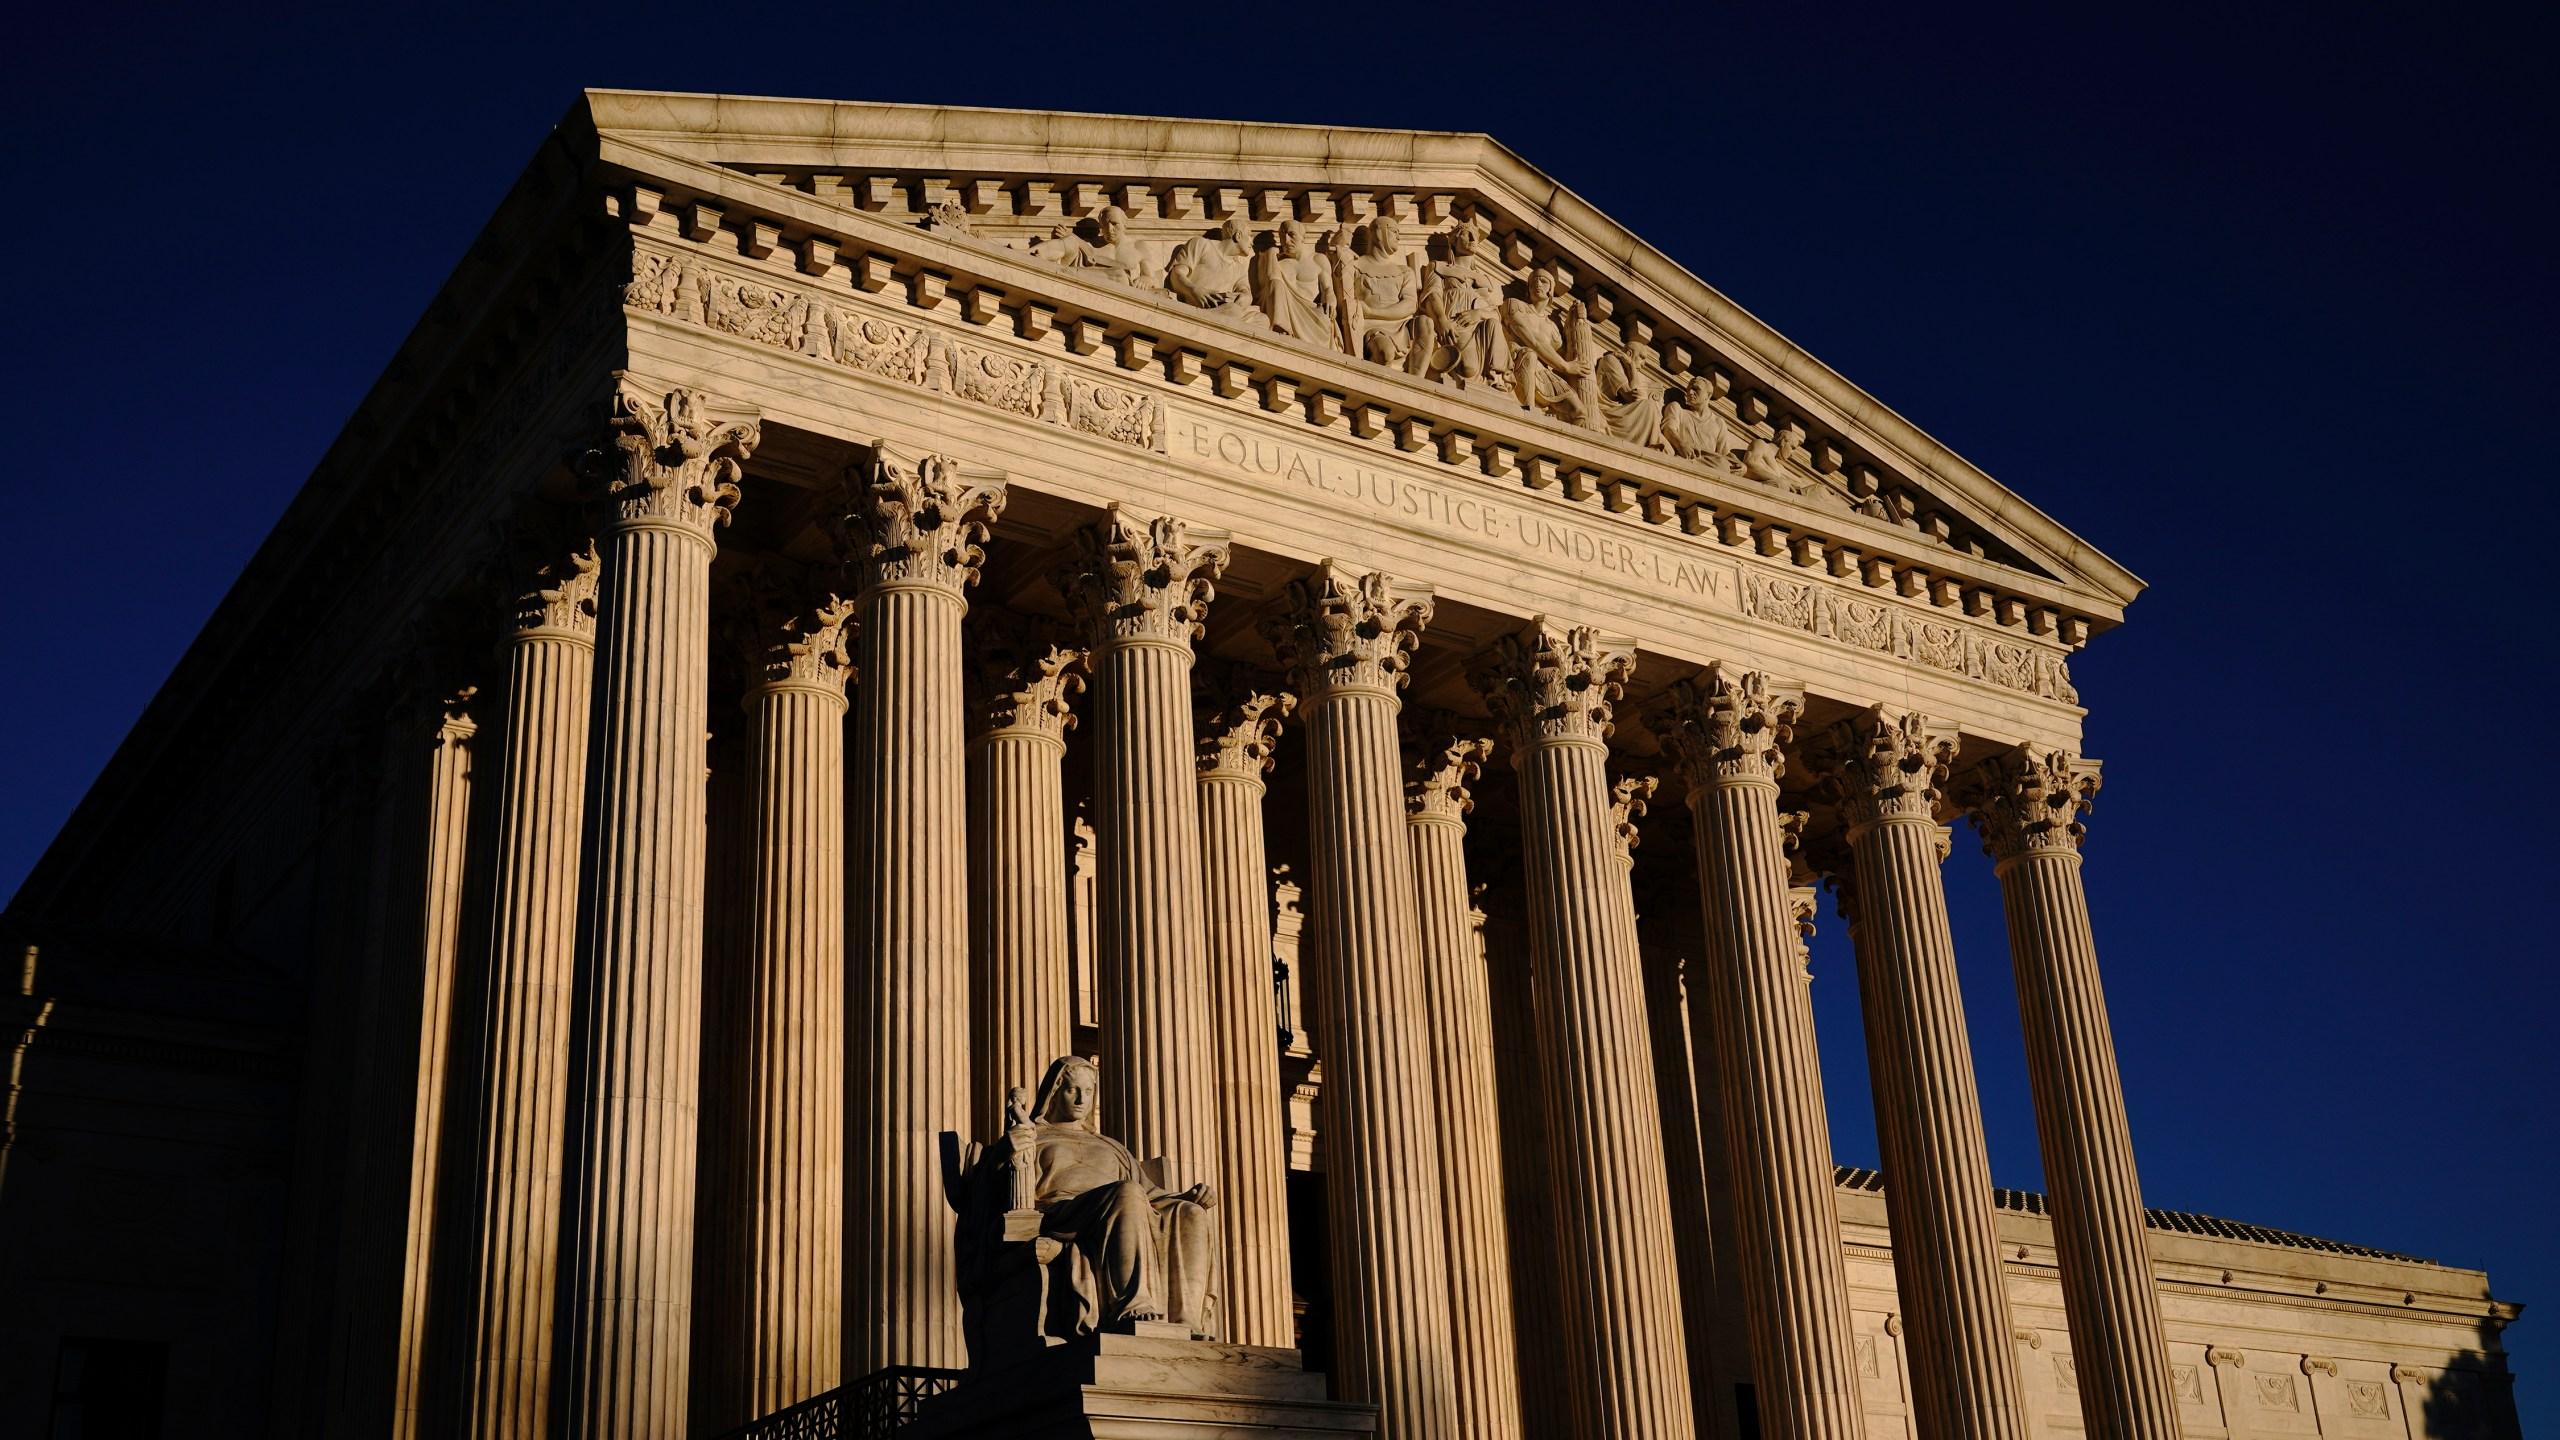 In this Nov. 2, 2020, file photo the Supreme Court is seen at sundown in Washington. (J. Scott Applewhite/Associated Press)